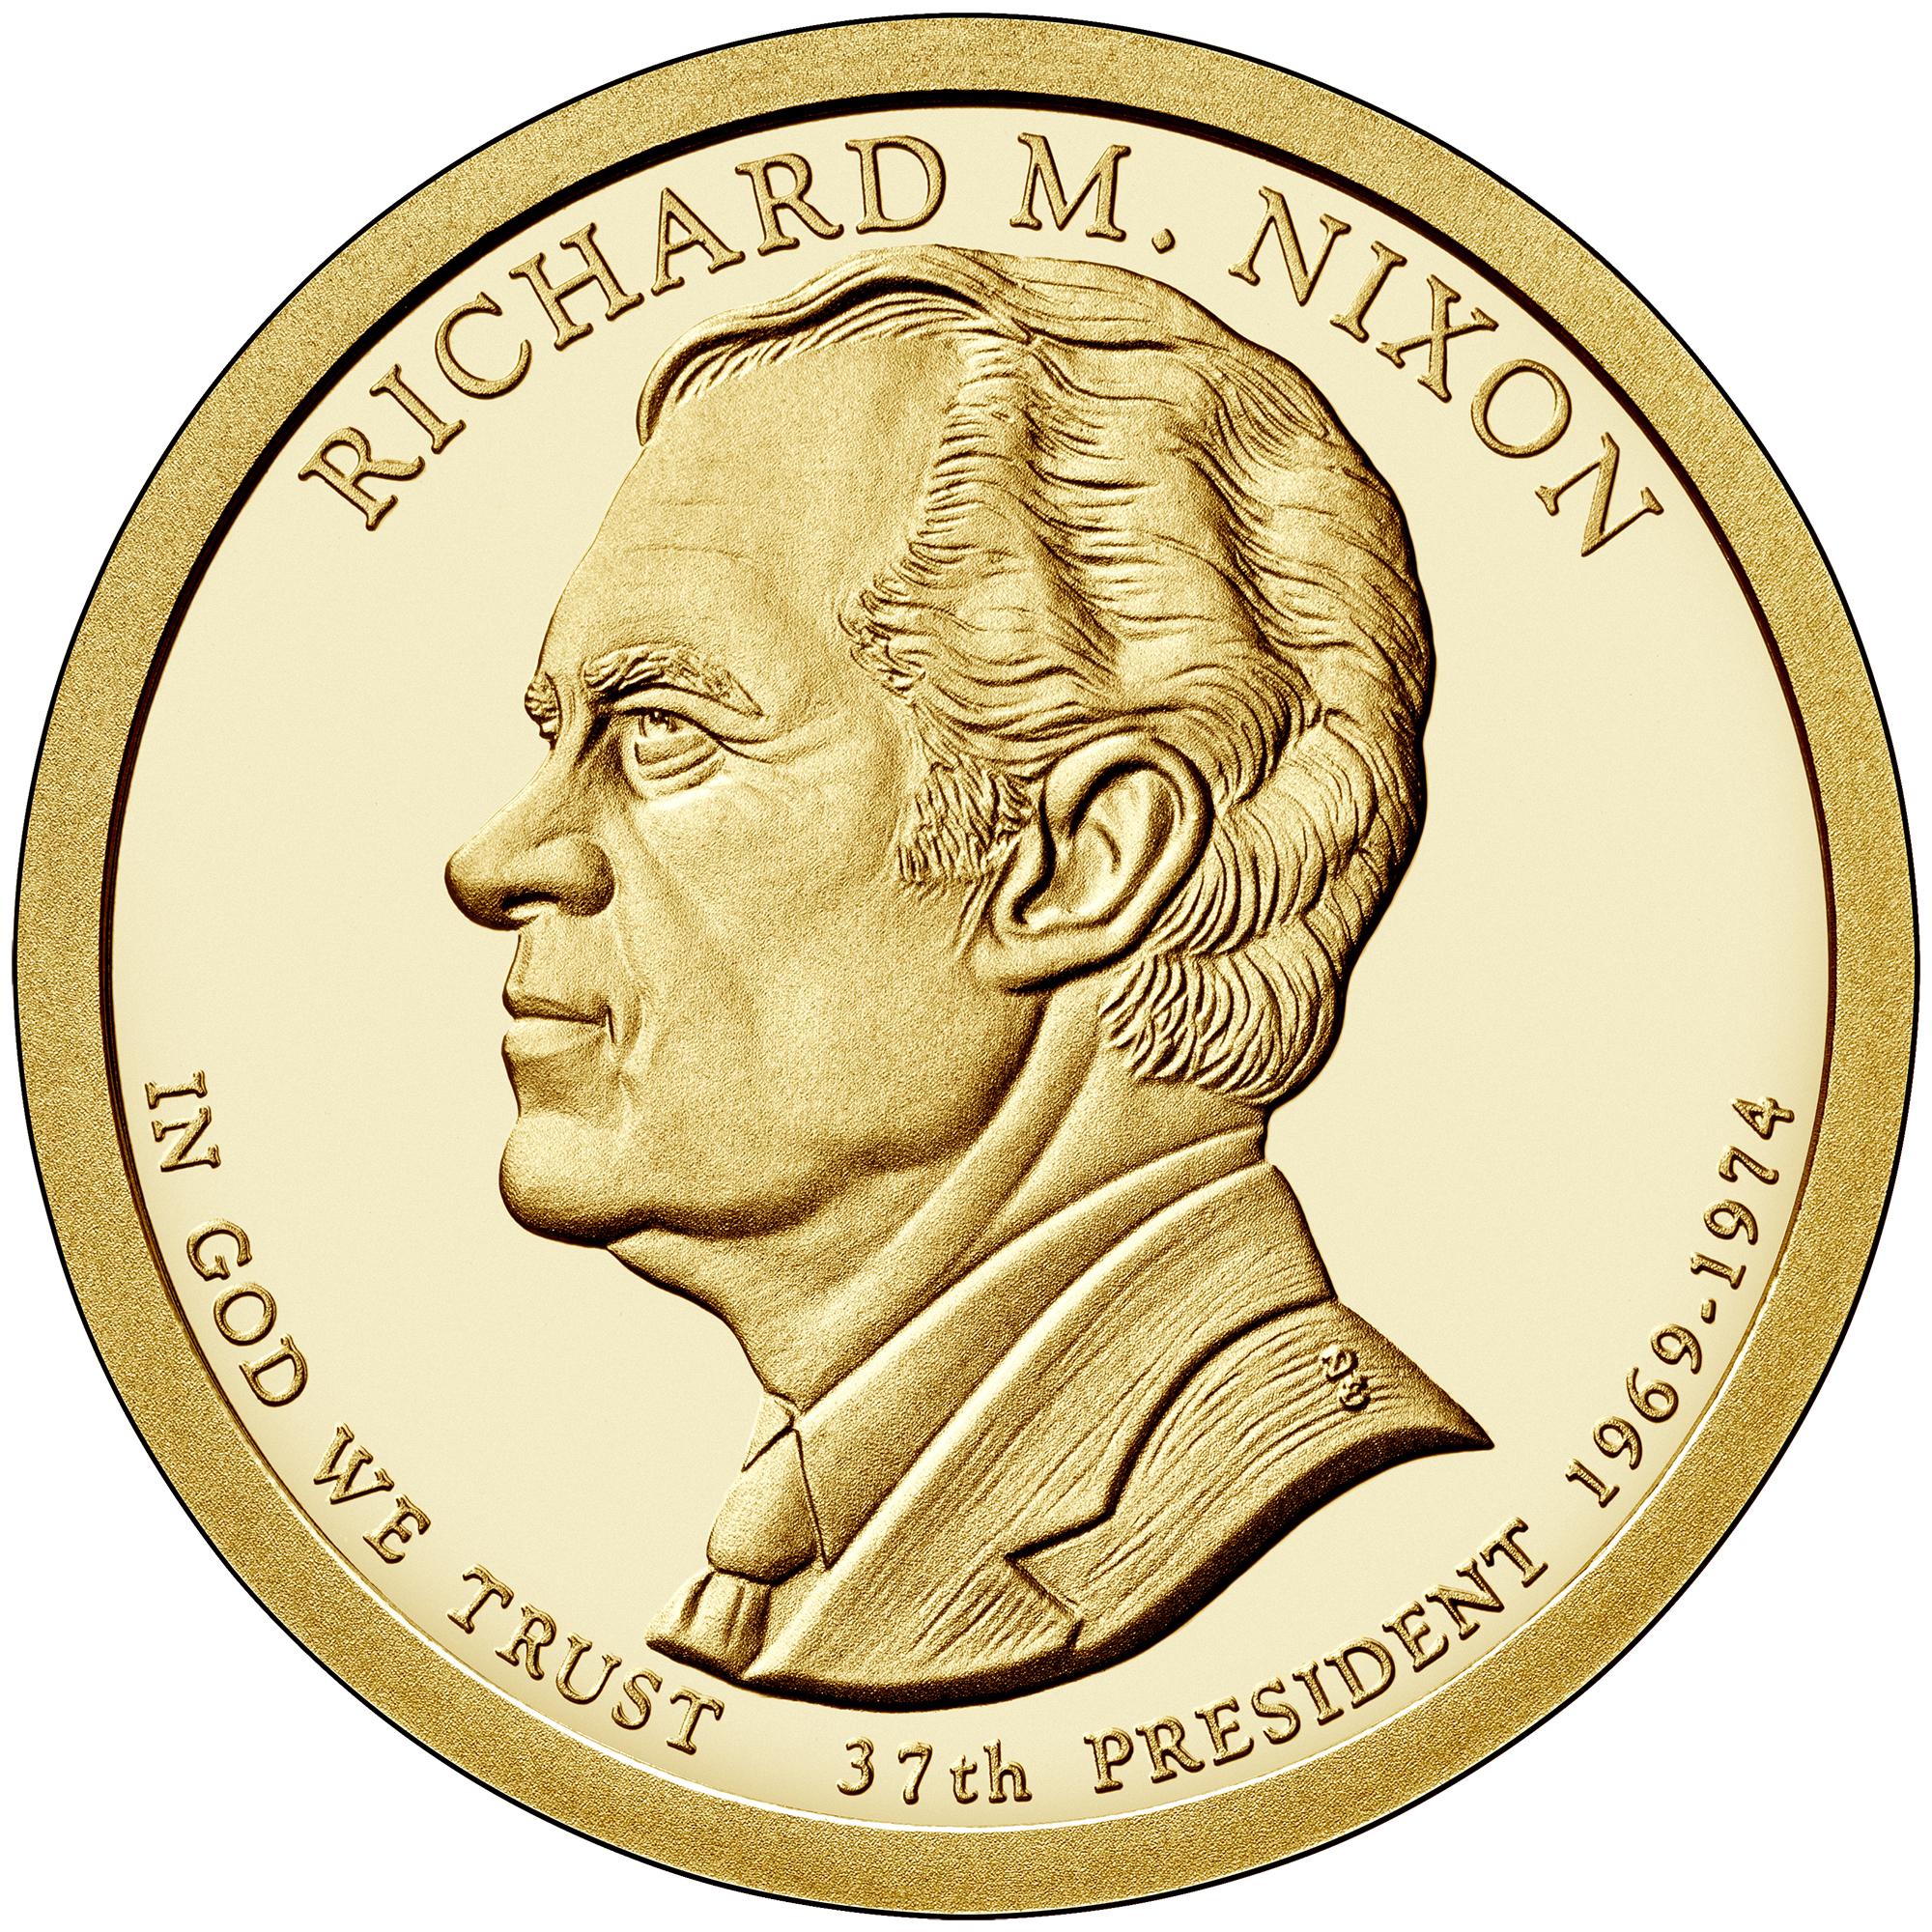 2016 Presidential Dollar Coin Richard M. Nixon Proof Obverse